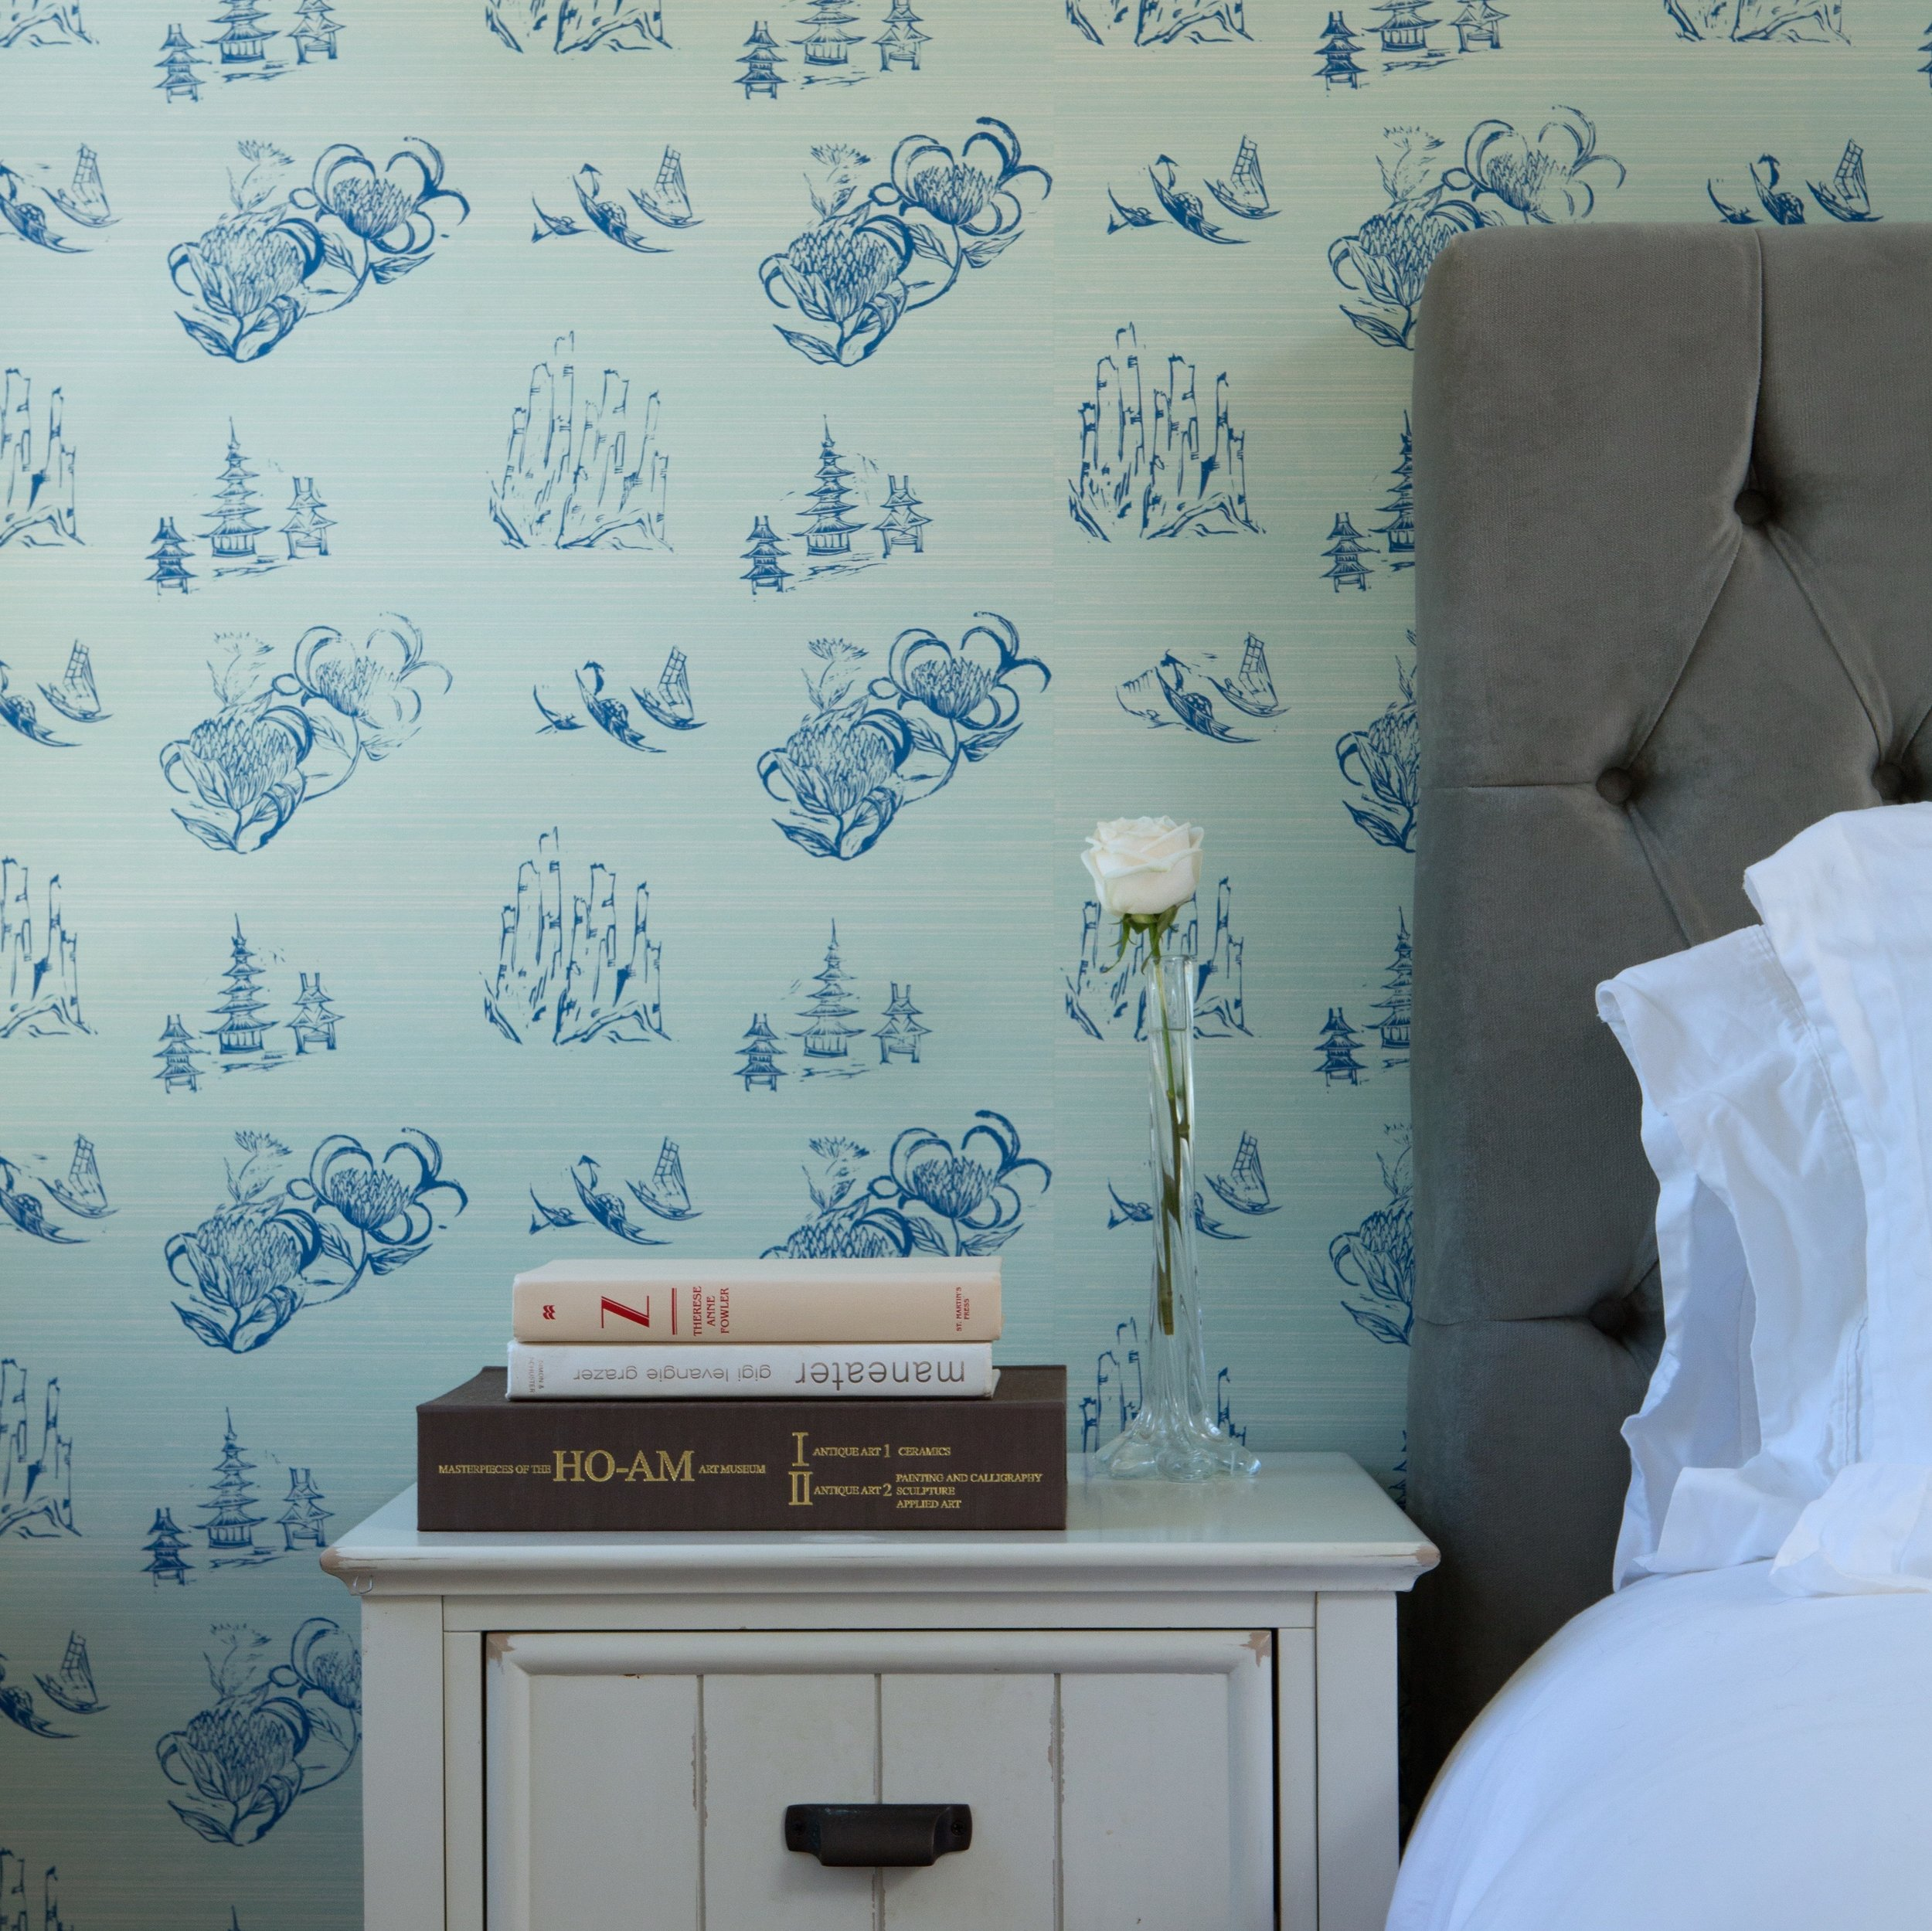 Toile Wallpaper in Mint, Photo by Benjamin Hoffman